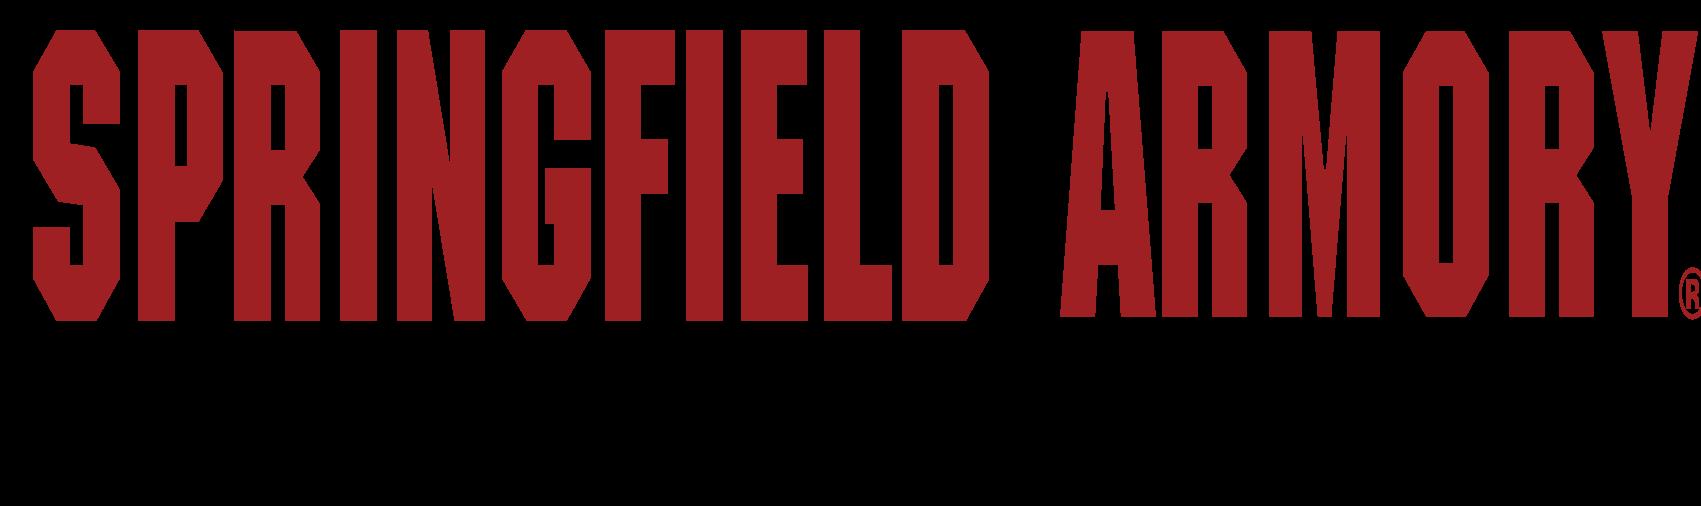 Springfield Armory Guns